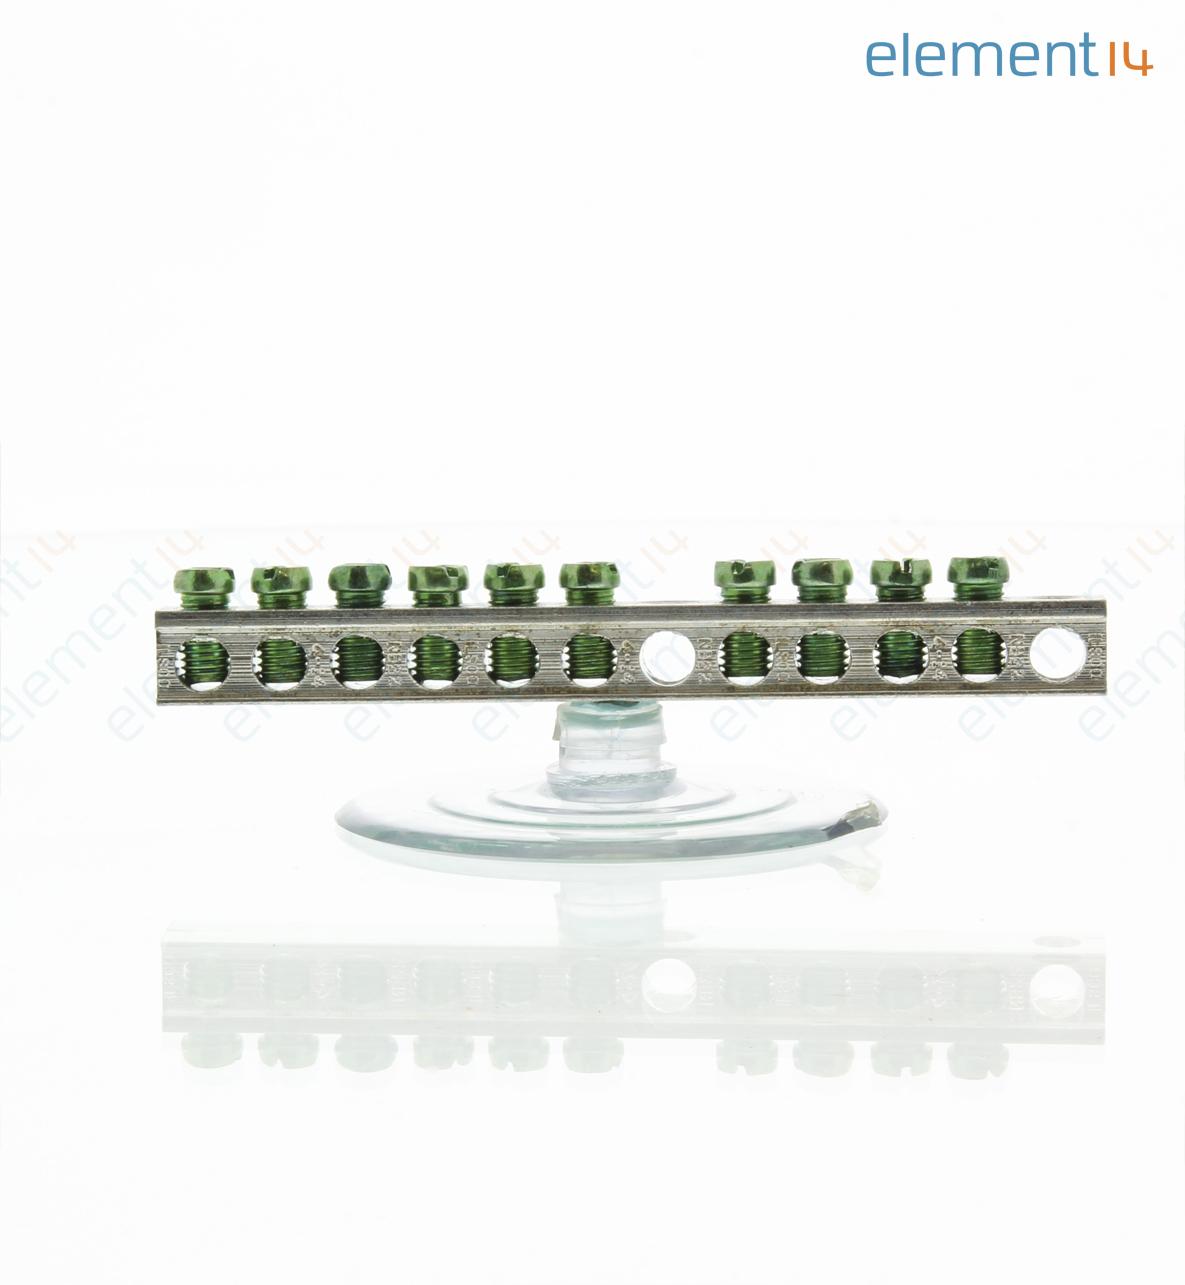 Gbk10p Eaton Cutler Hammer Circuit Breaker Accessory Ground Bar Gfci Receptacle Fault Interrupter Ygf20l China